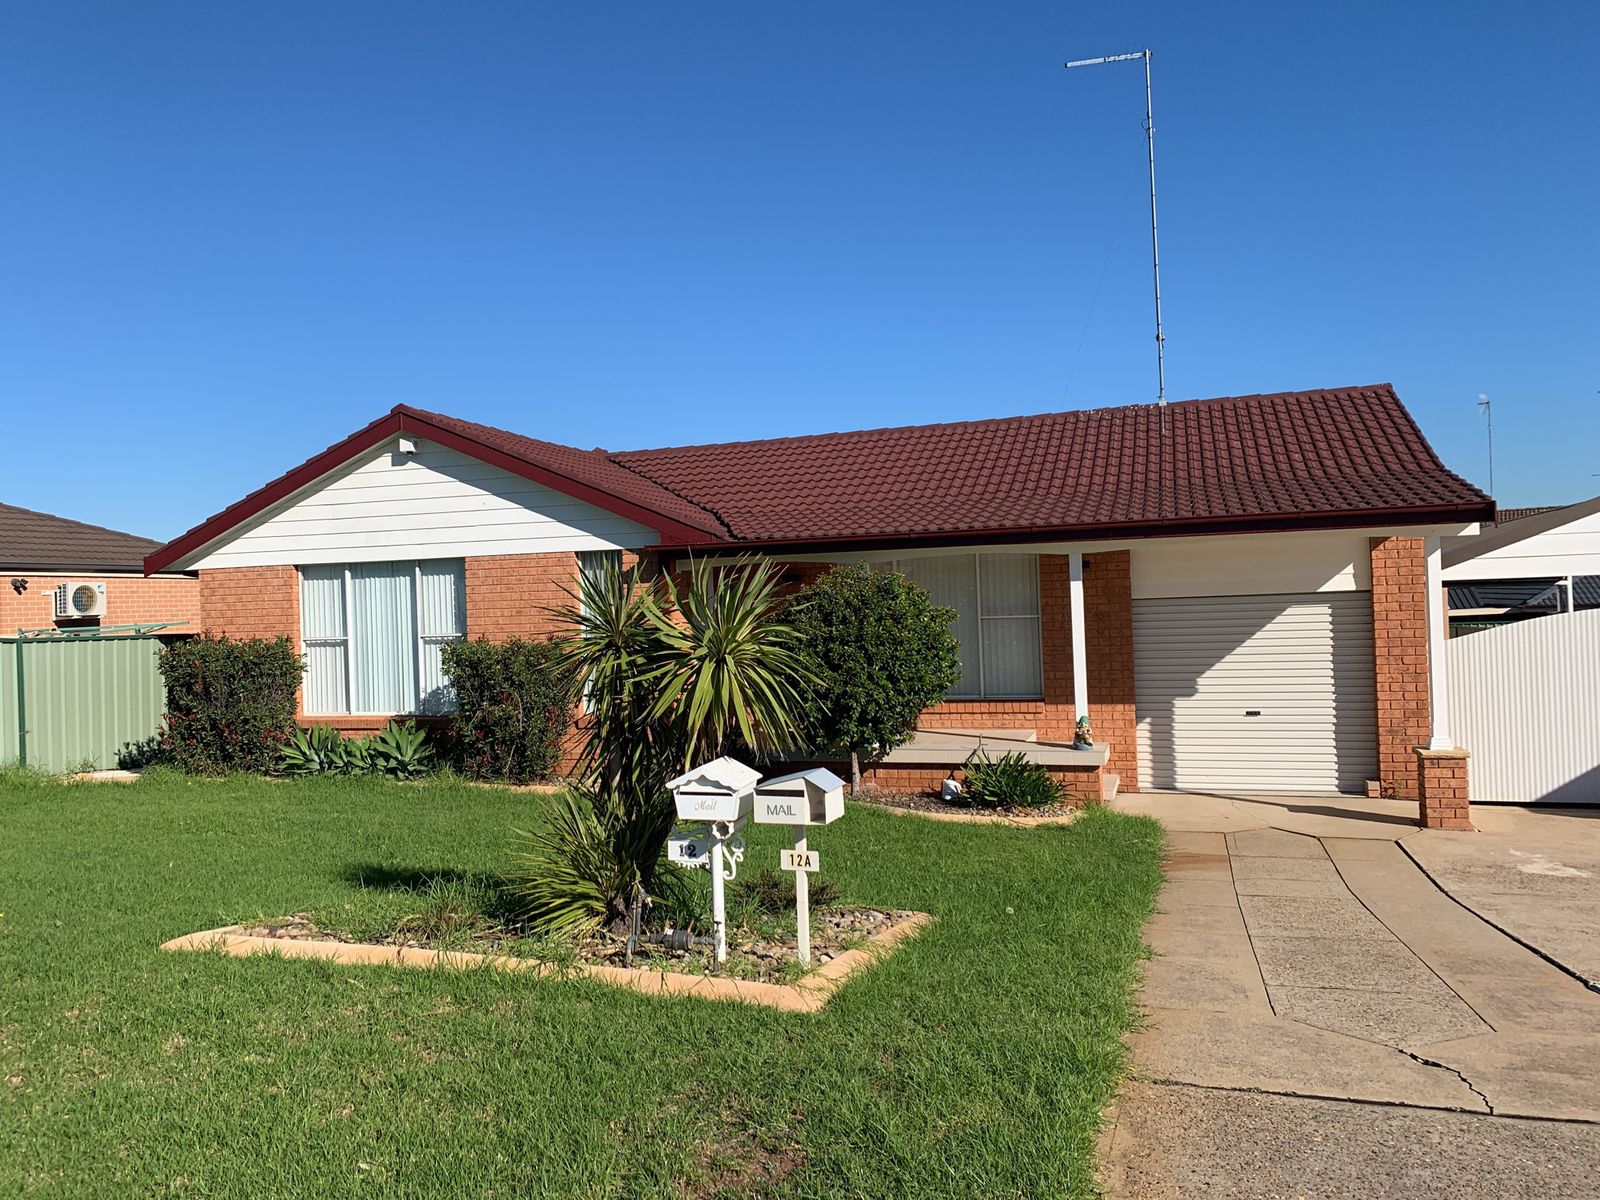 12 Chatsworth Road, St Clair, NSW 2759